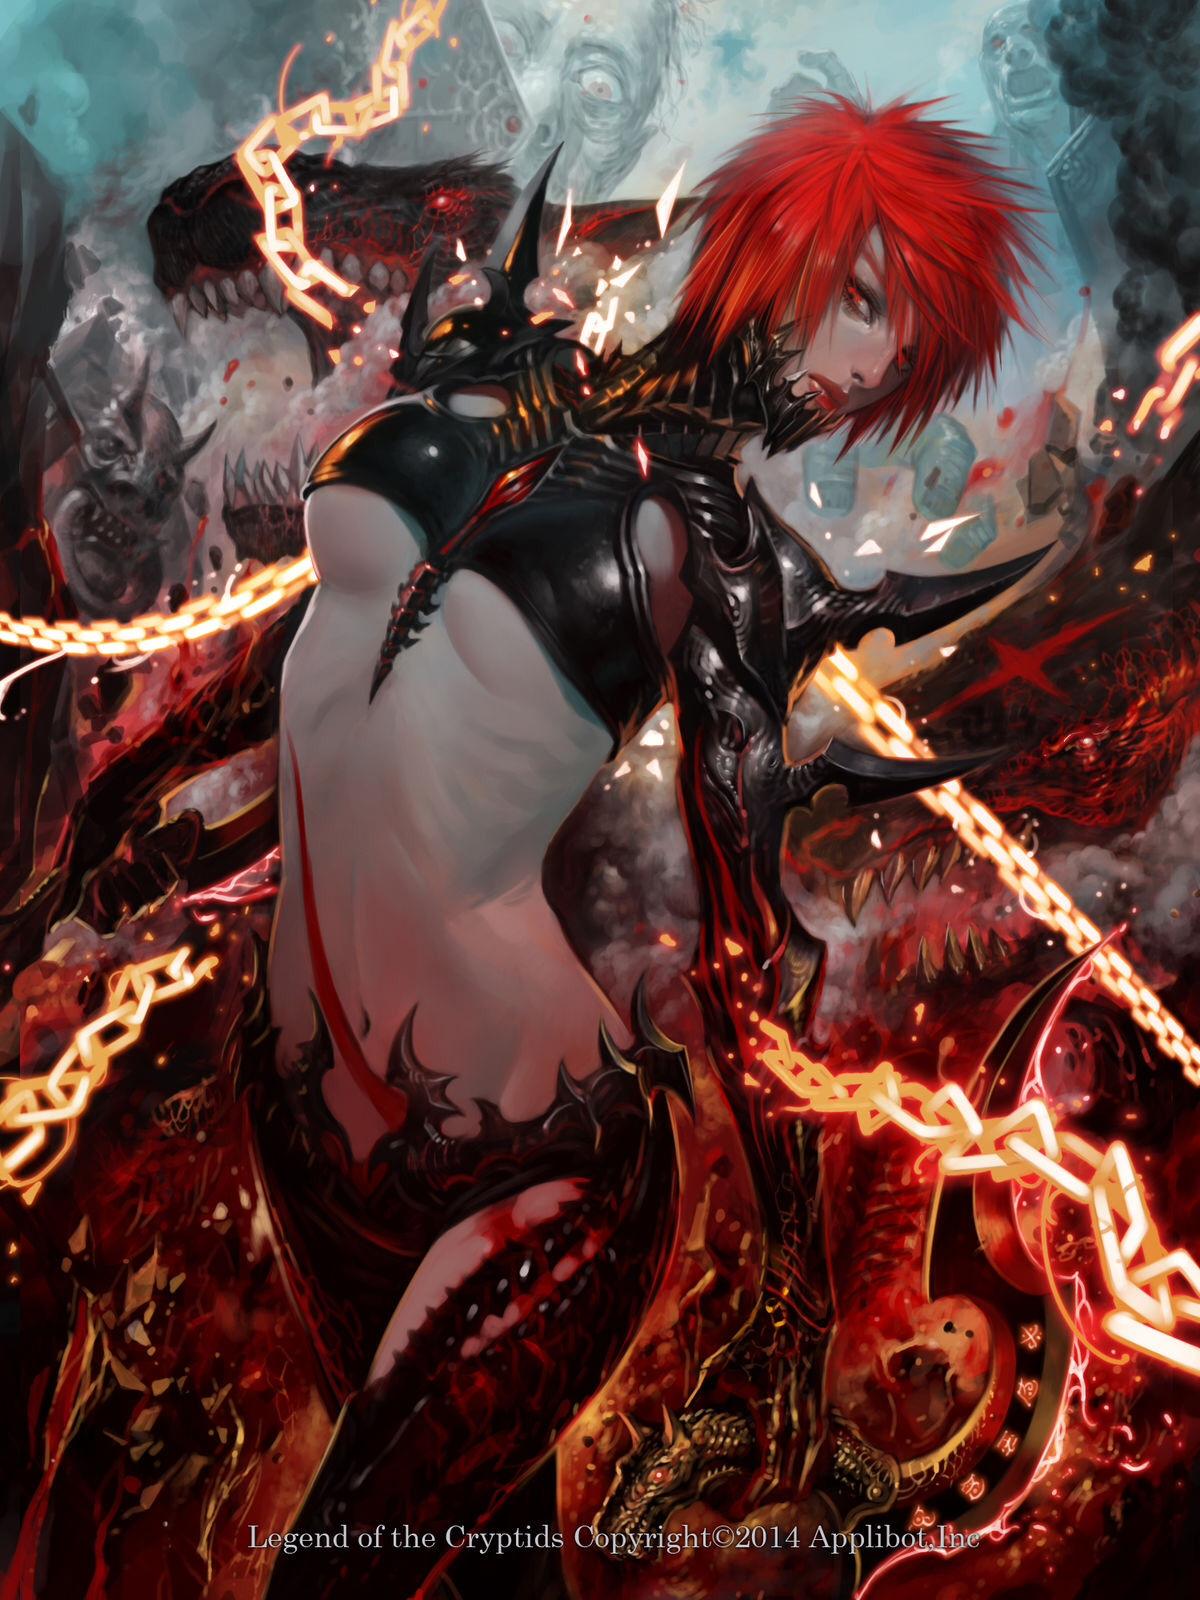 Anime Steampunk Girl Wallpaper The Amazing Digital Artworks Of Rupid Leejm Fantasy Art